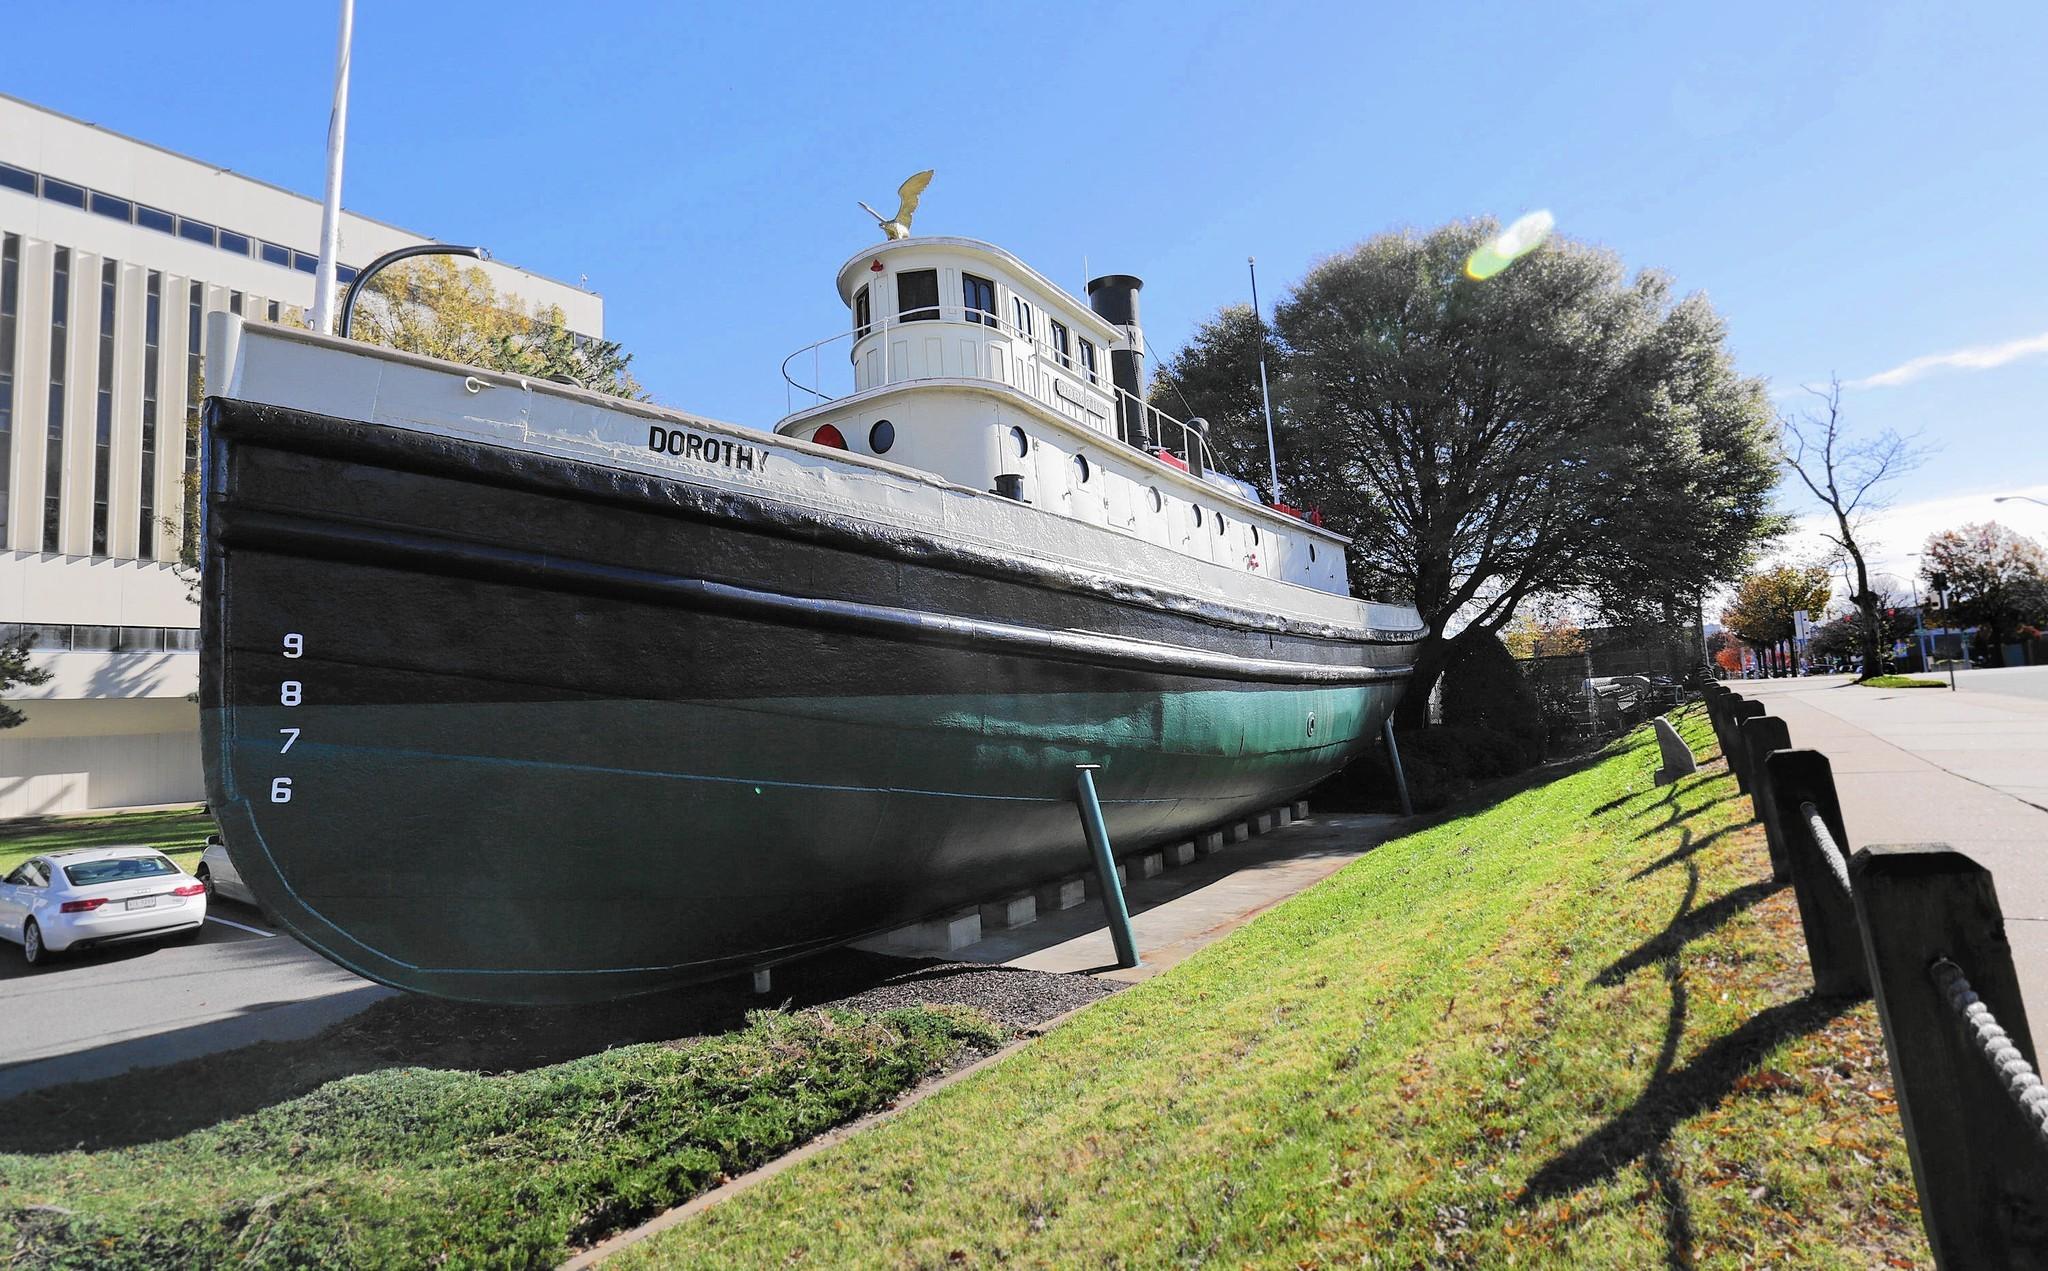 Tugboat Dorothy heralded new age at Newport News